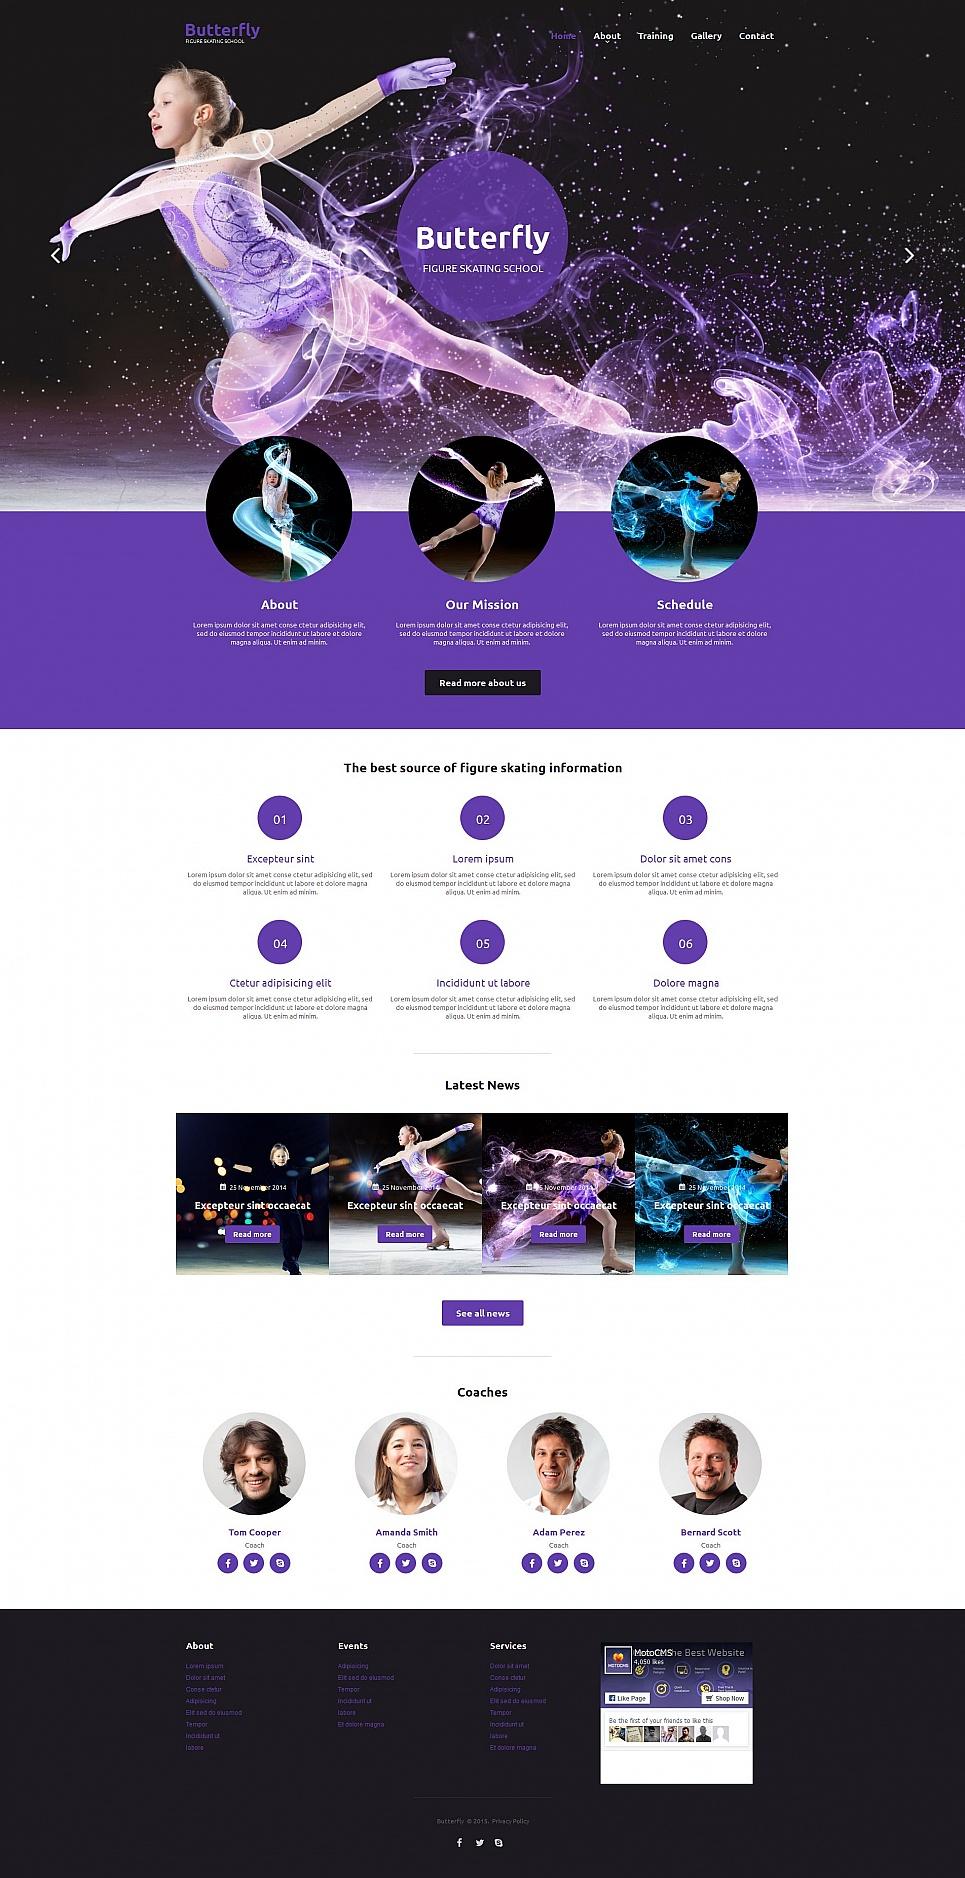 MotoCMS HTML Шаблон #55667 из категории Спорт - image